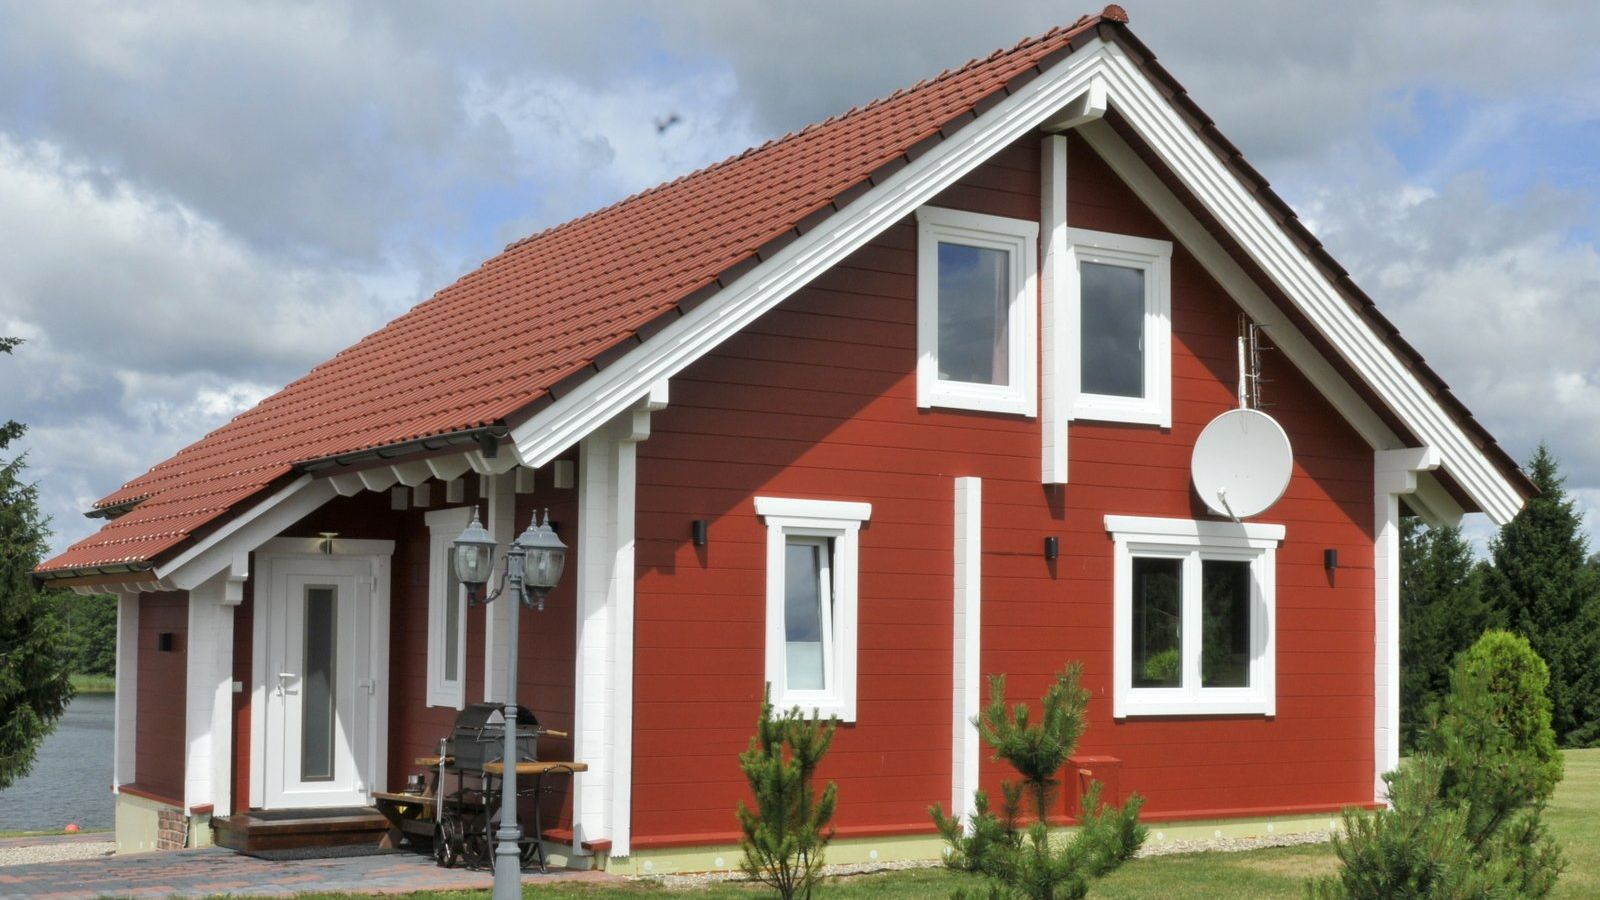 Ferienh user aus holz gro e hochwertige exklusive - Gartenhaus 30 qm ...